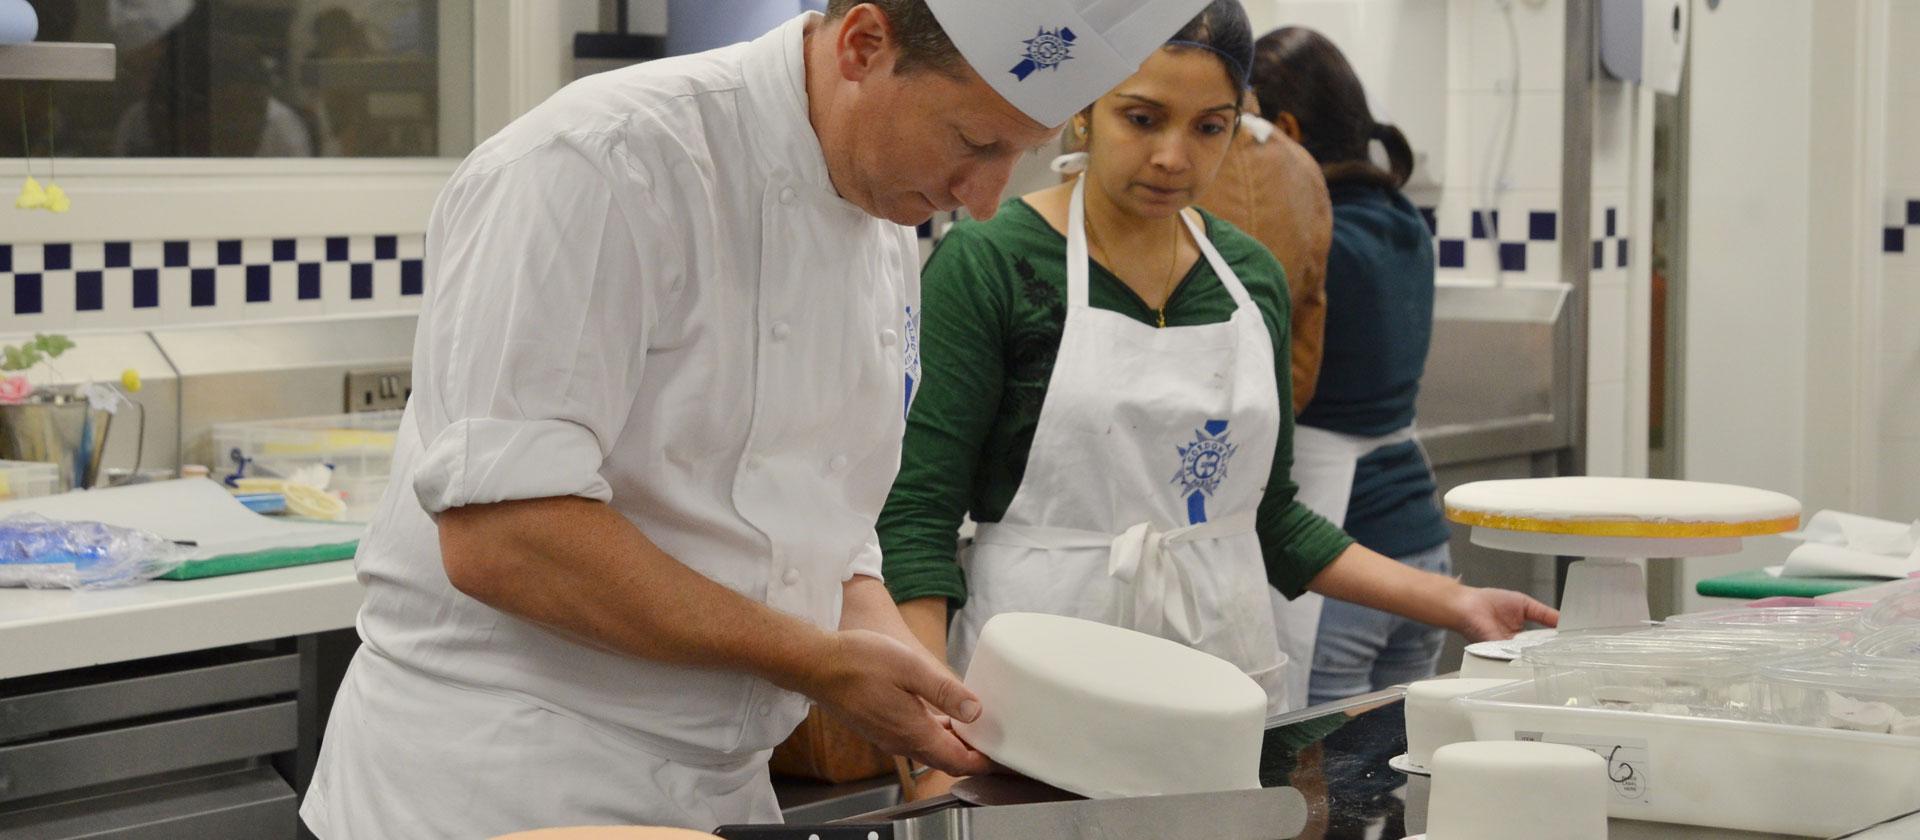 patisserie master chef matthew hodgett - le cordon bleu london